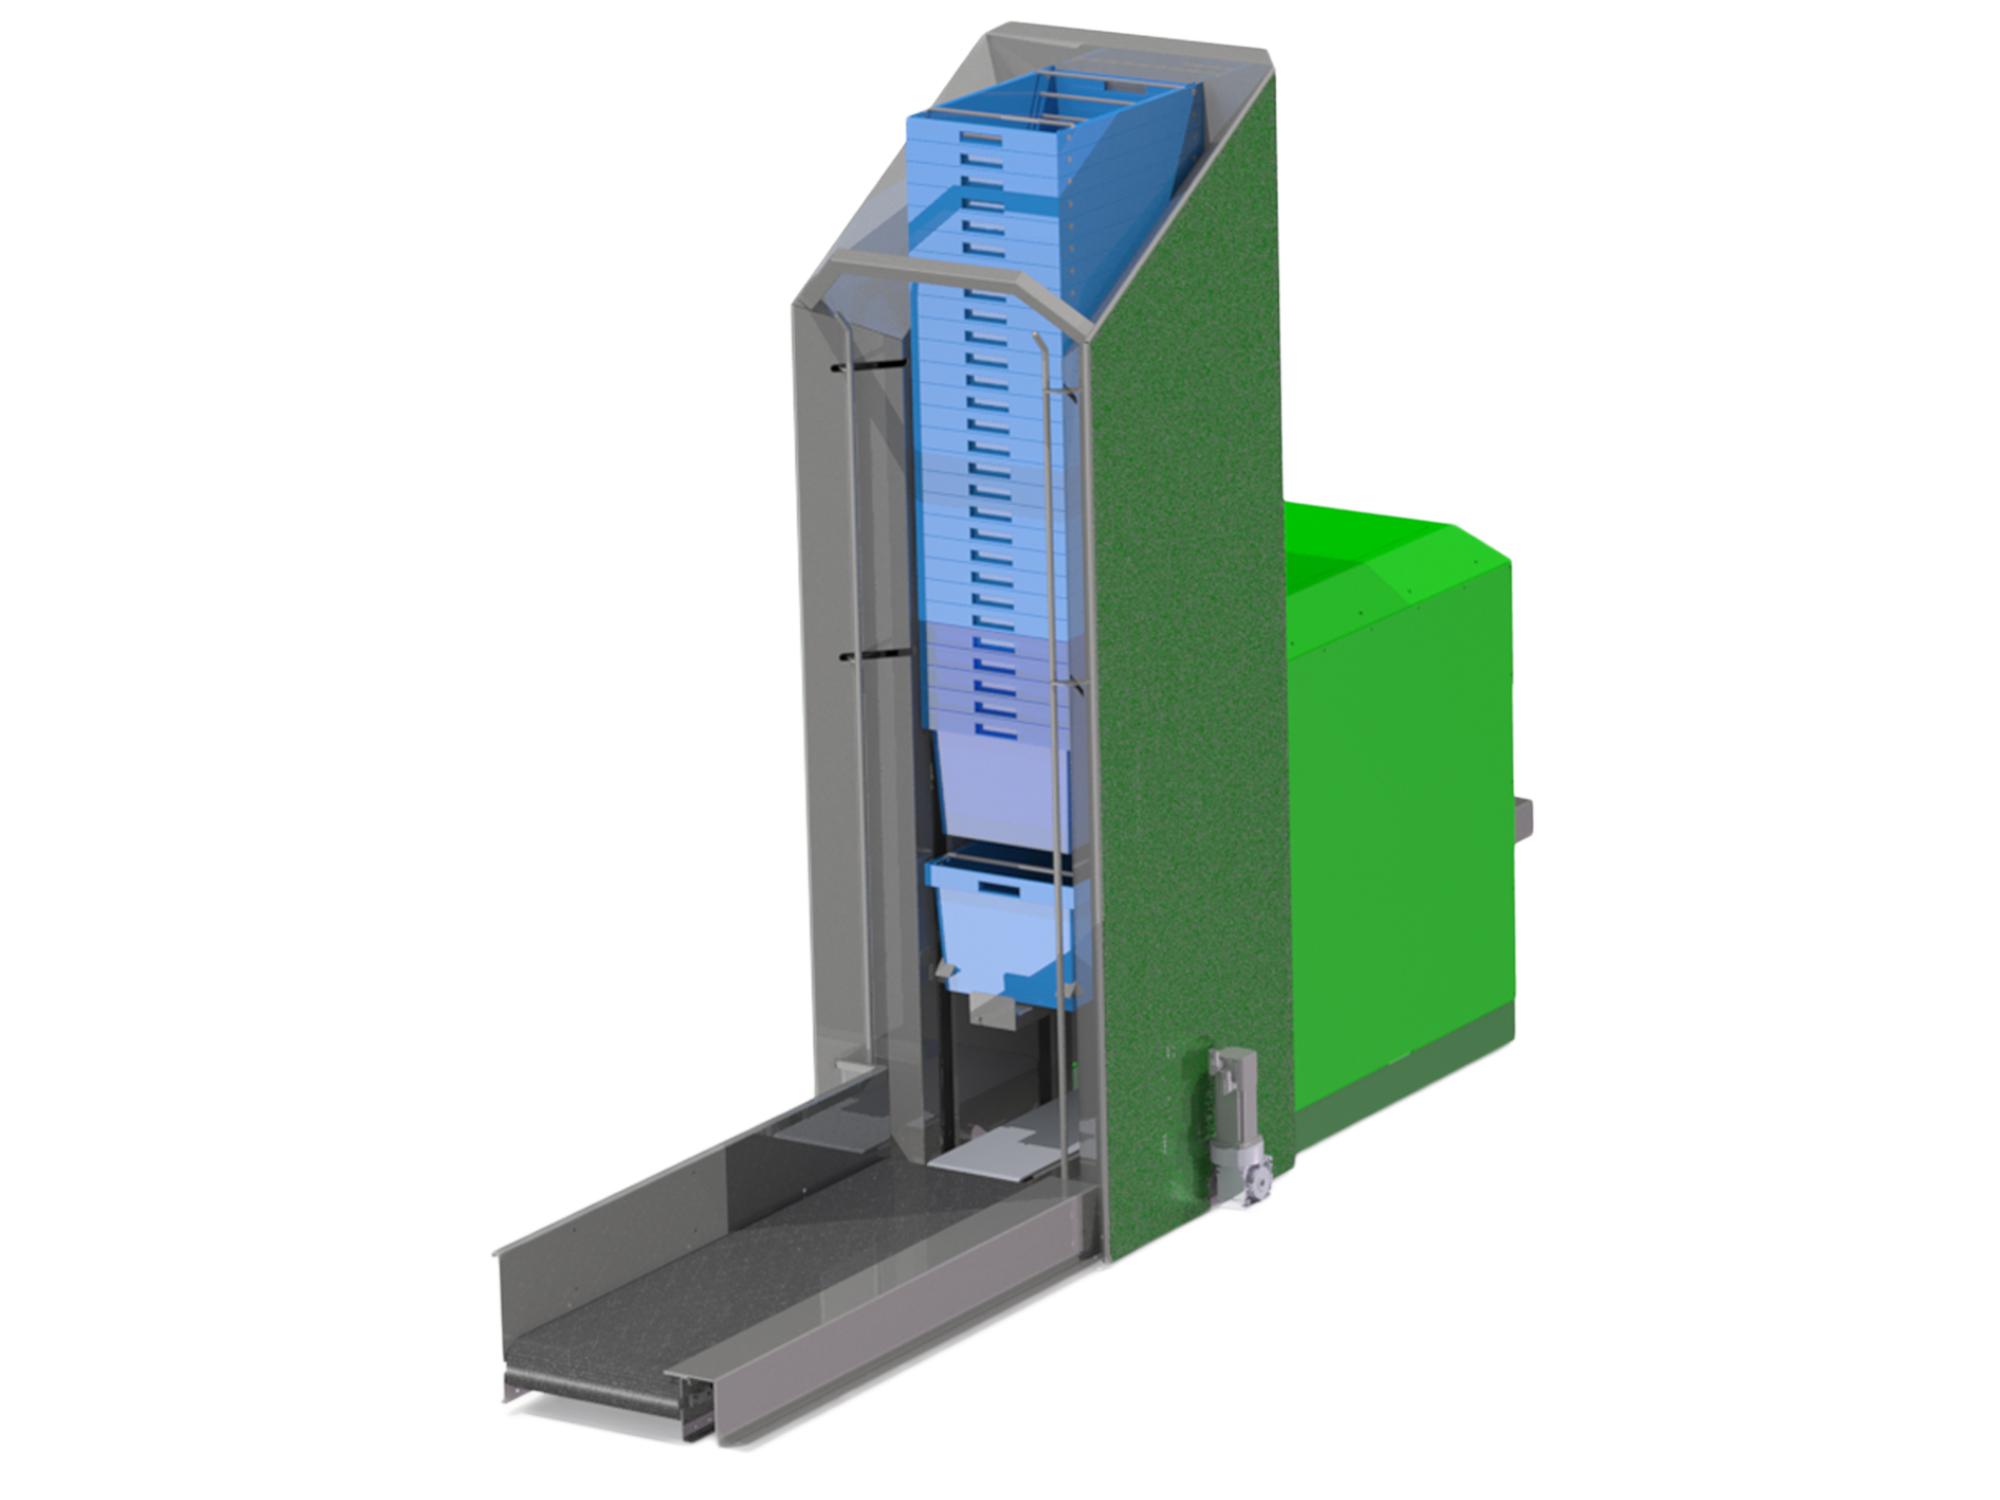 CED15 Case Erector and Dispenser